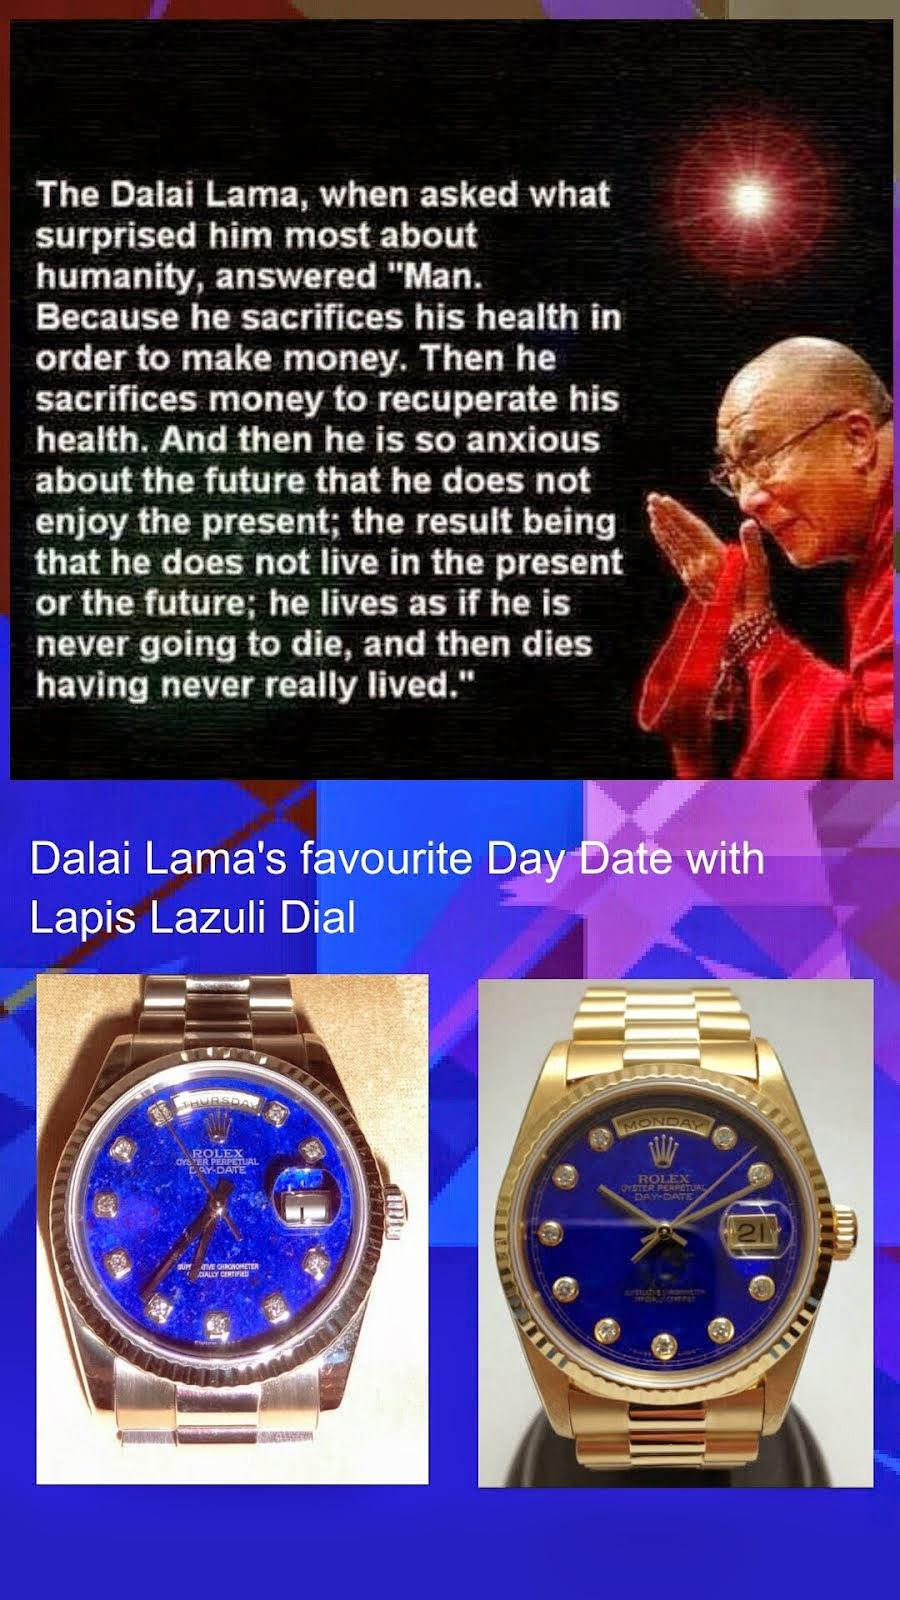 Dalai Lama's Inspirative Quote about Life!